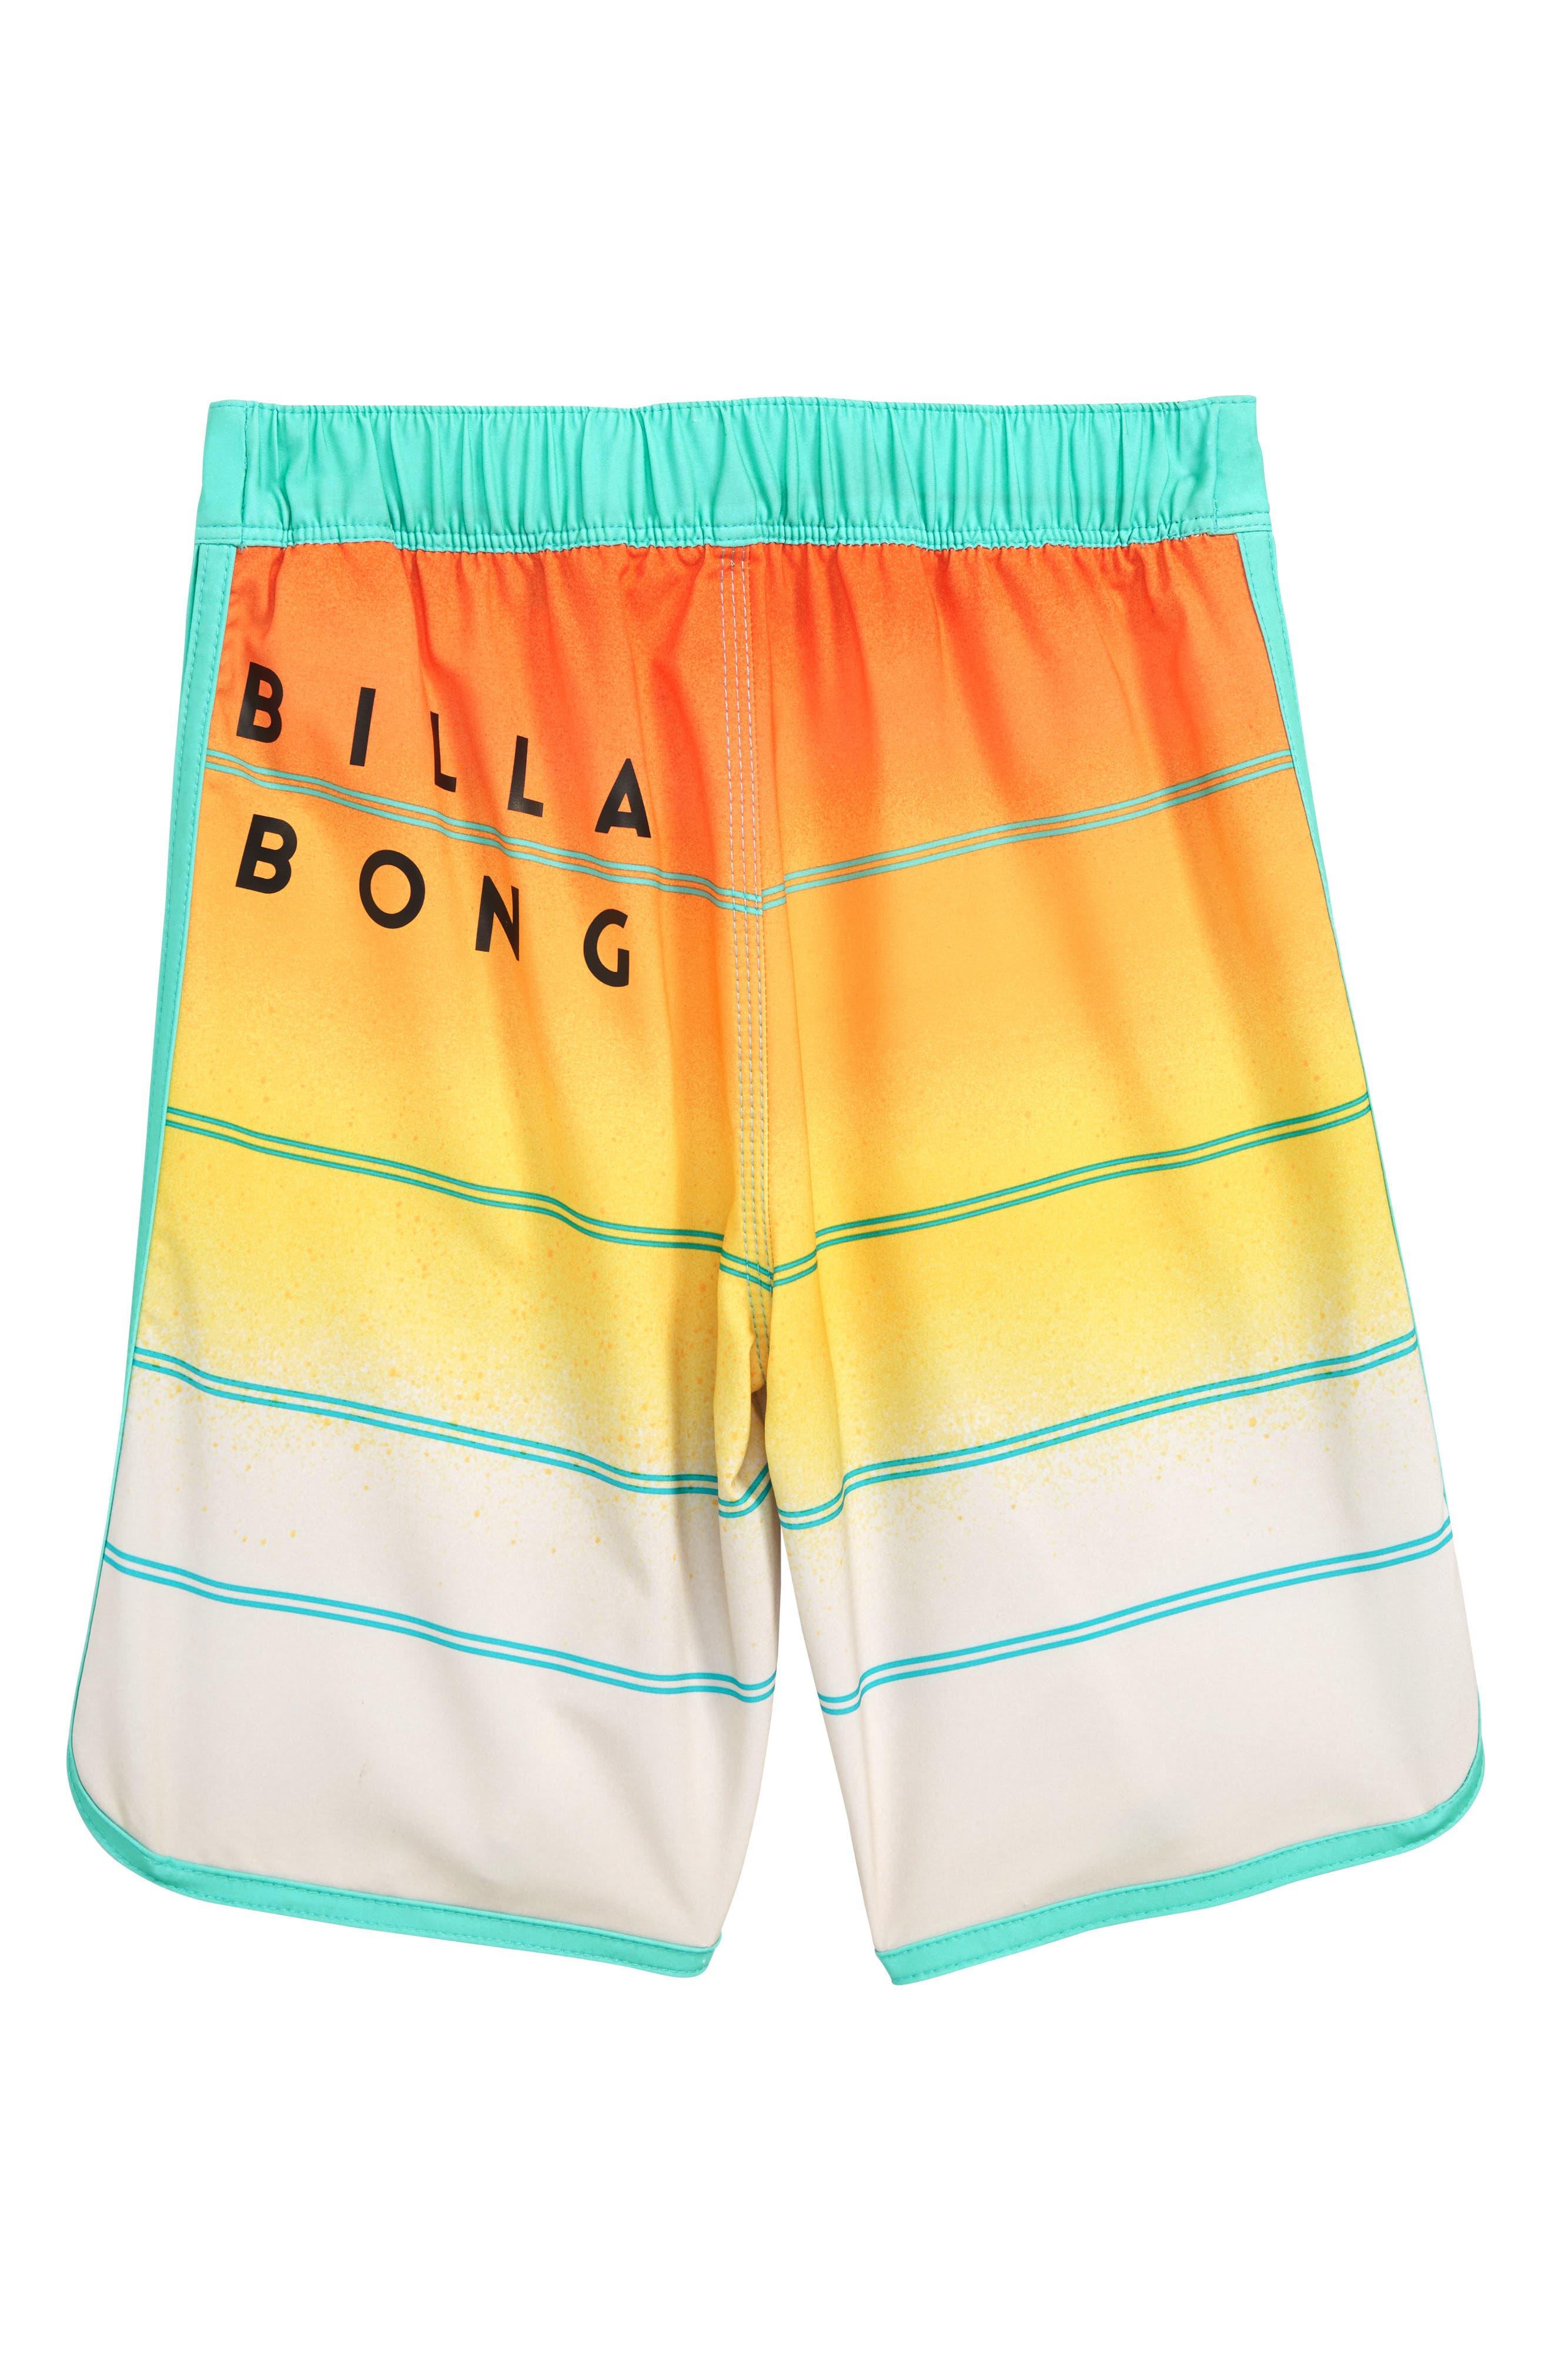 73 X Stripe Board Shorts,                             Alternate thumbnail 2, color,                             Yellow